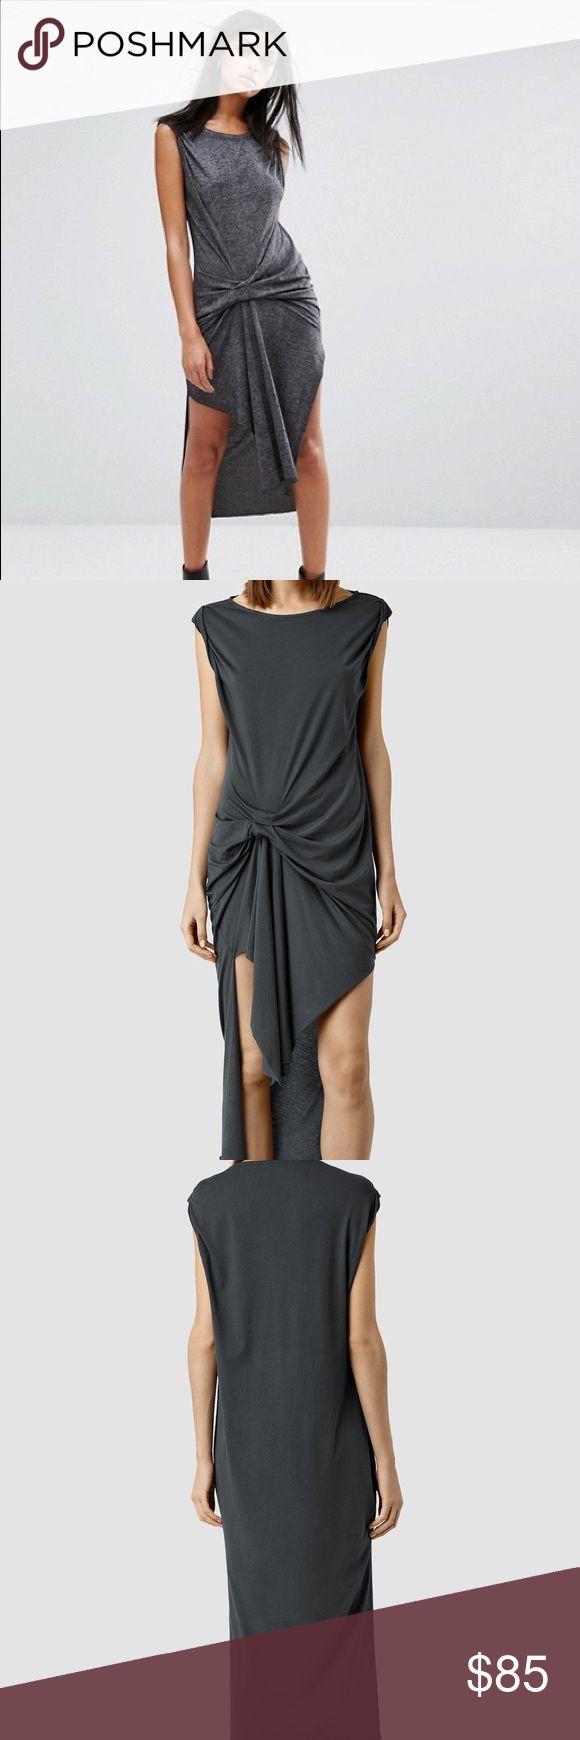 ALLSAINTS riviera dress EUC: no rips, tears, or stains. UK 10 US 6 EURO 38. All Saints Dresses